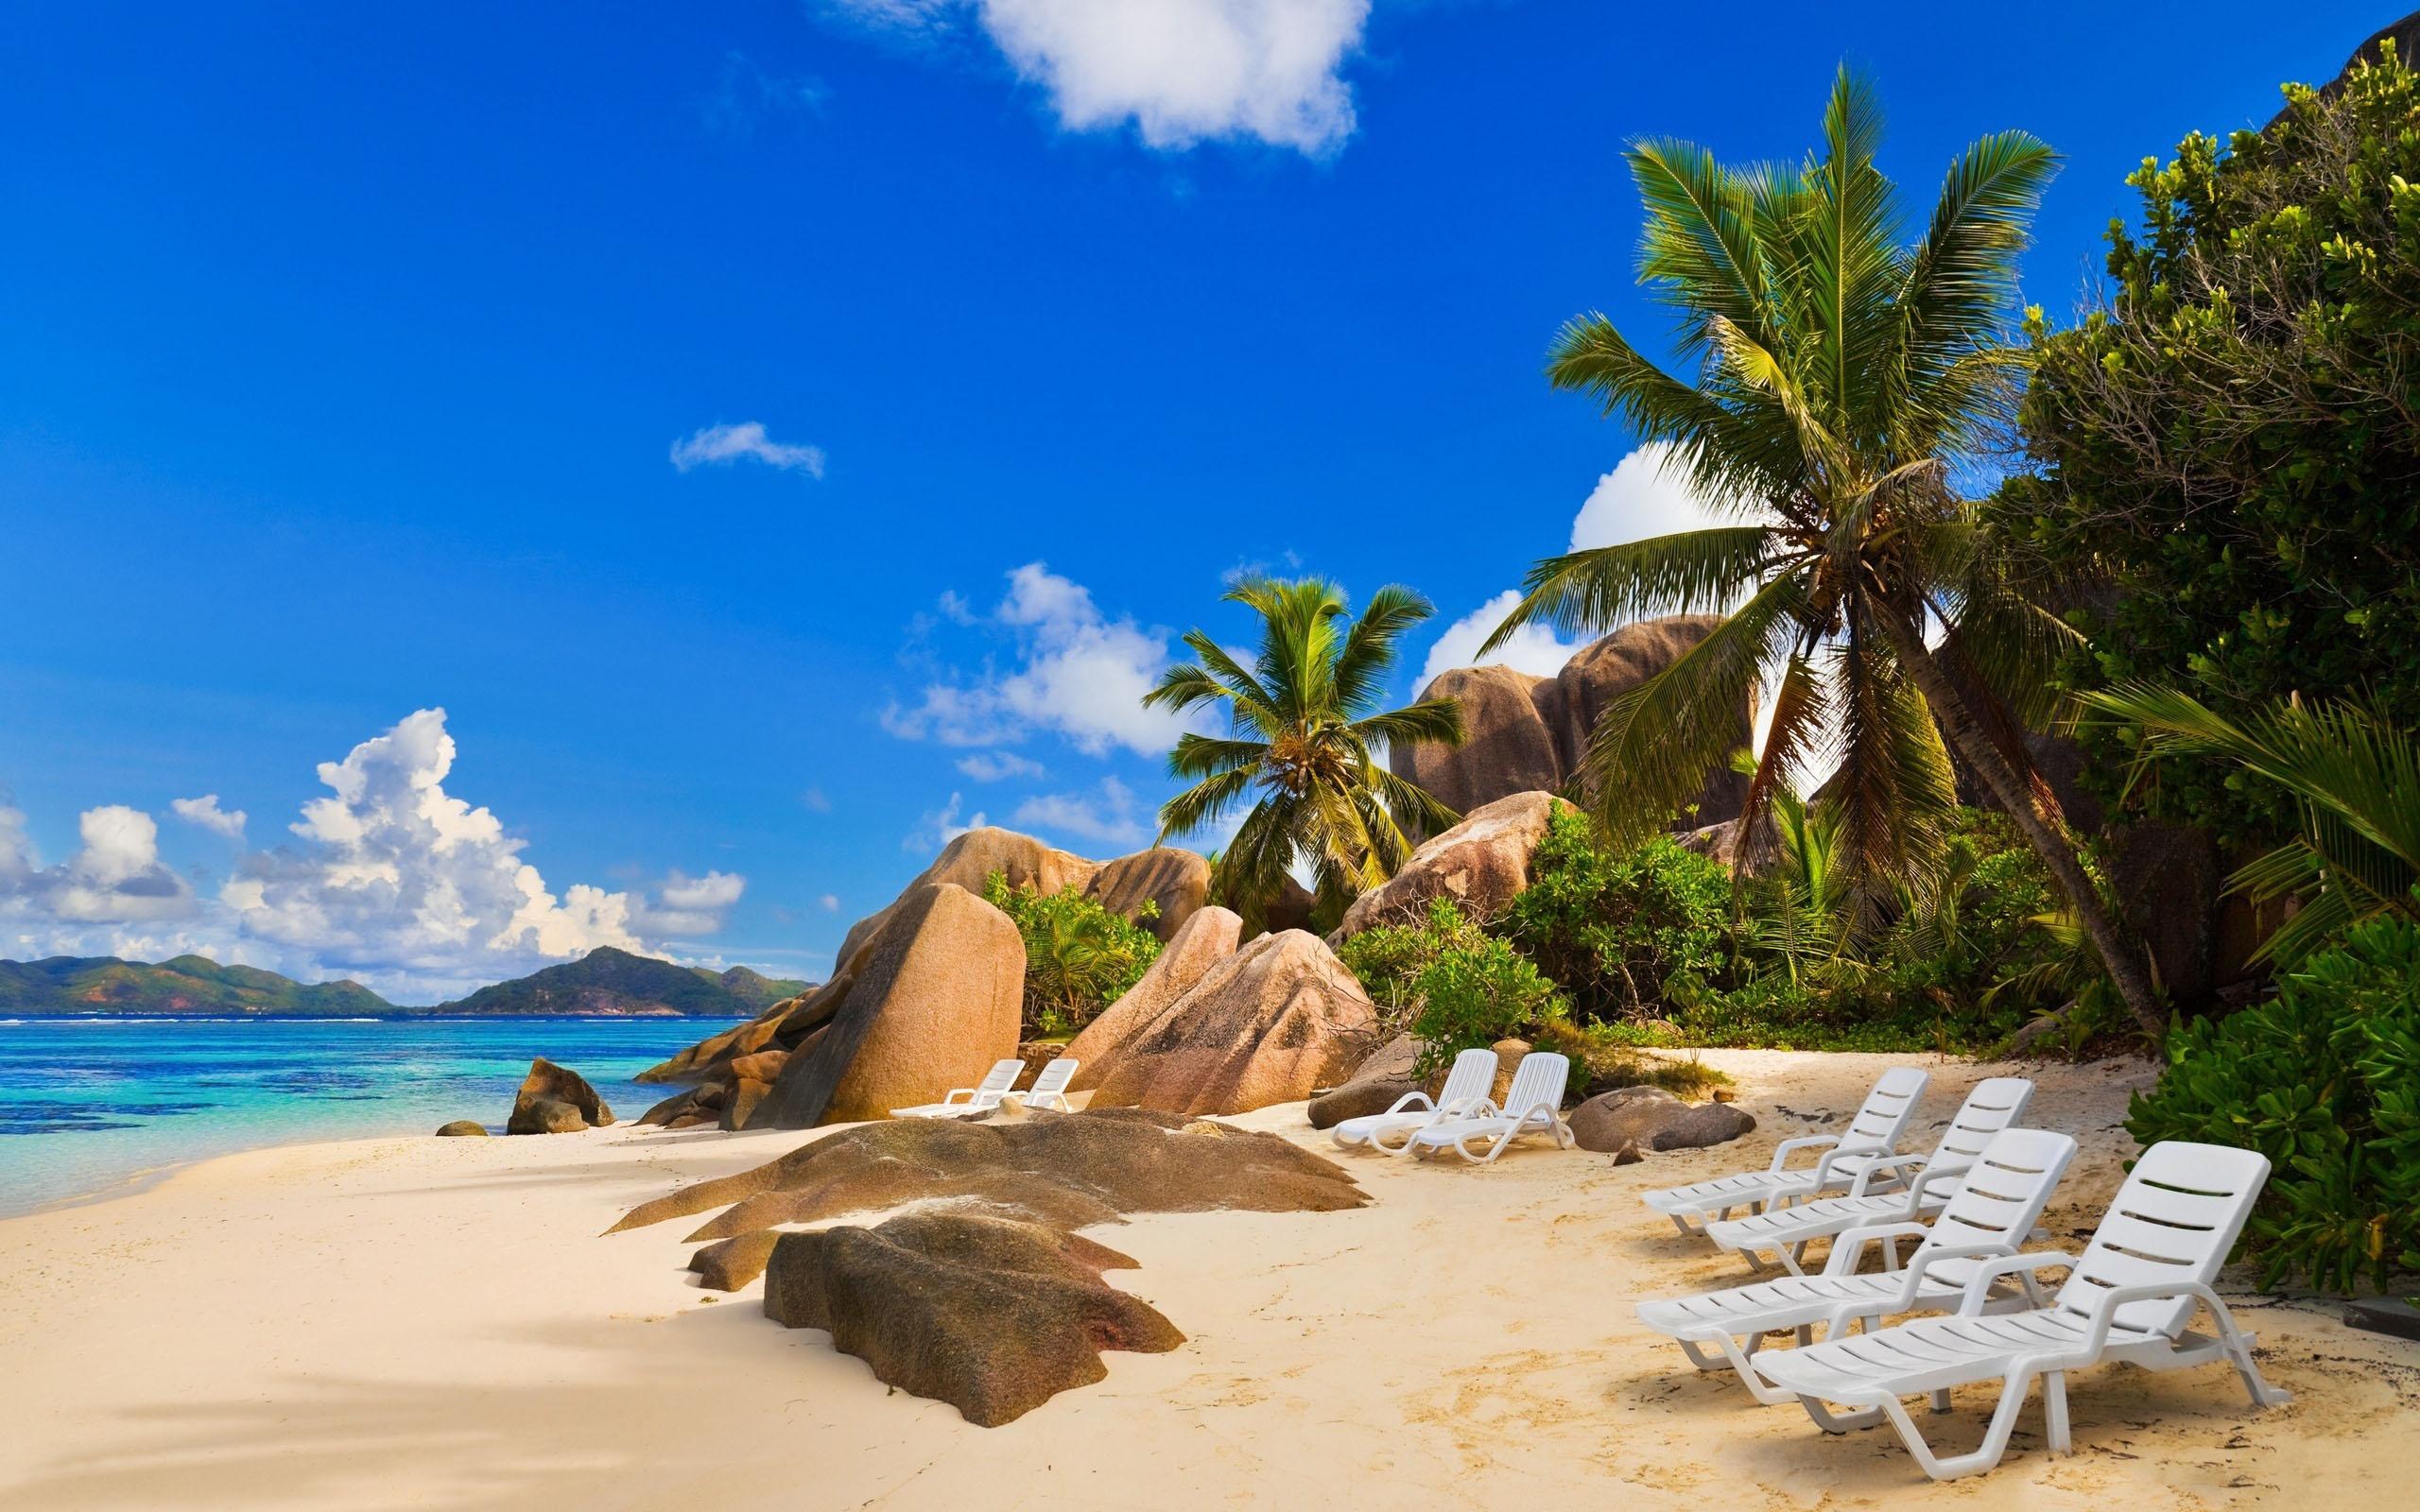 Beach Palm Trees HD Wallpaper ImageBankbiz 2560x1600